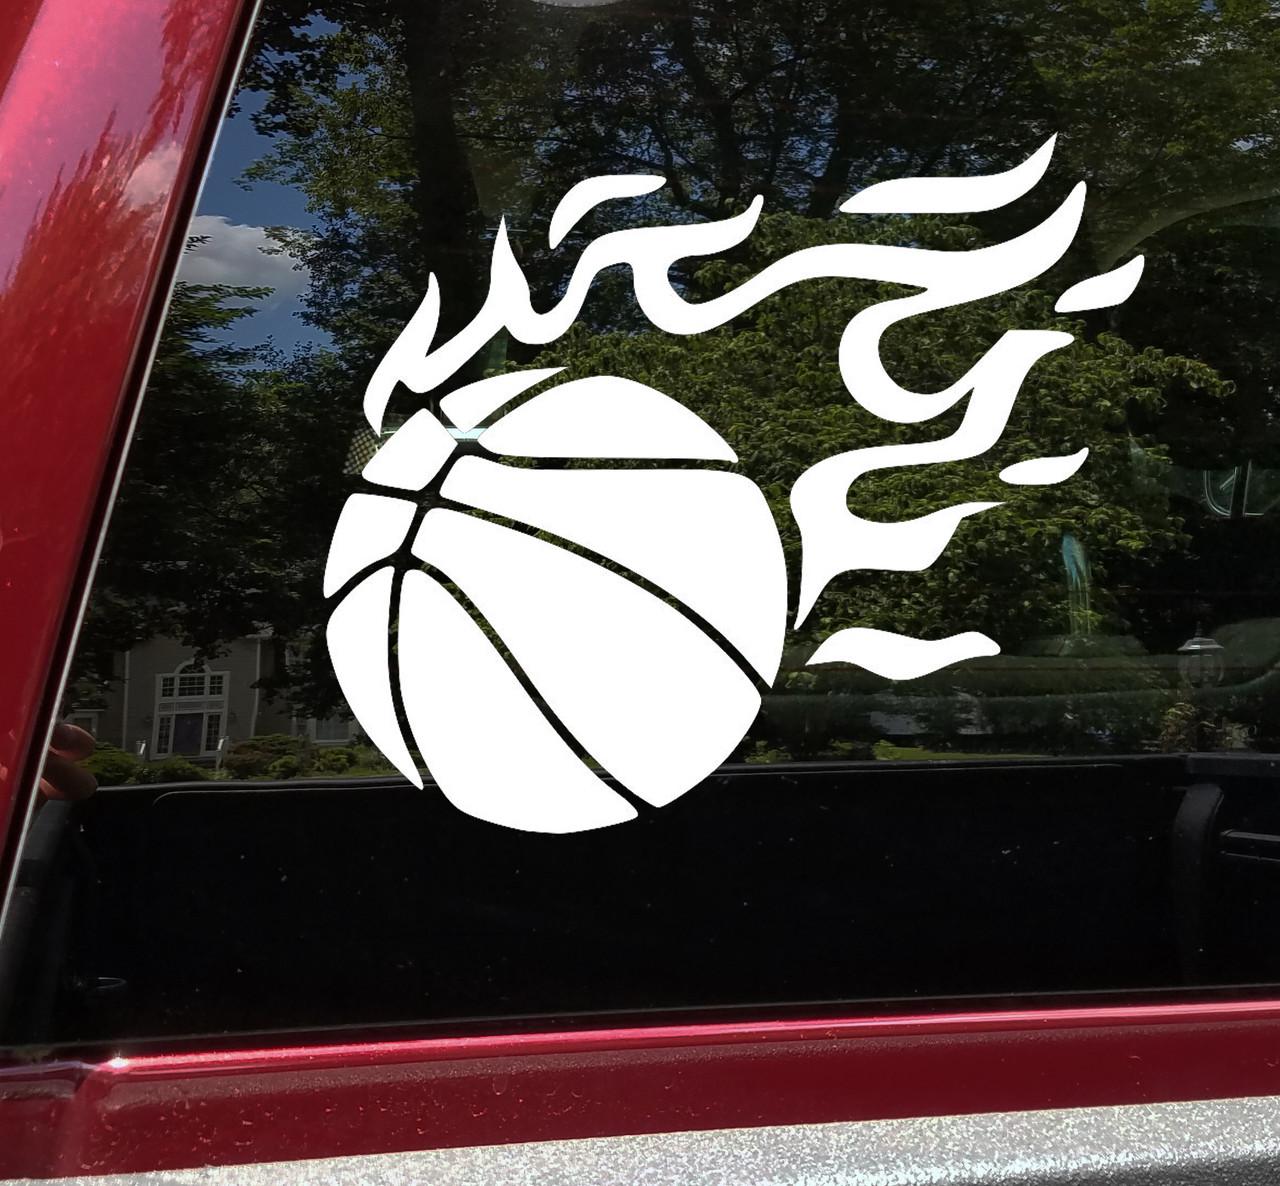 Flaming Basketball Vinyl Decal - Flames Ball Hoops Court Team - Die Cut Sticker